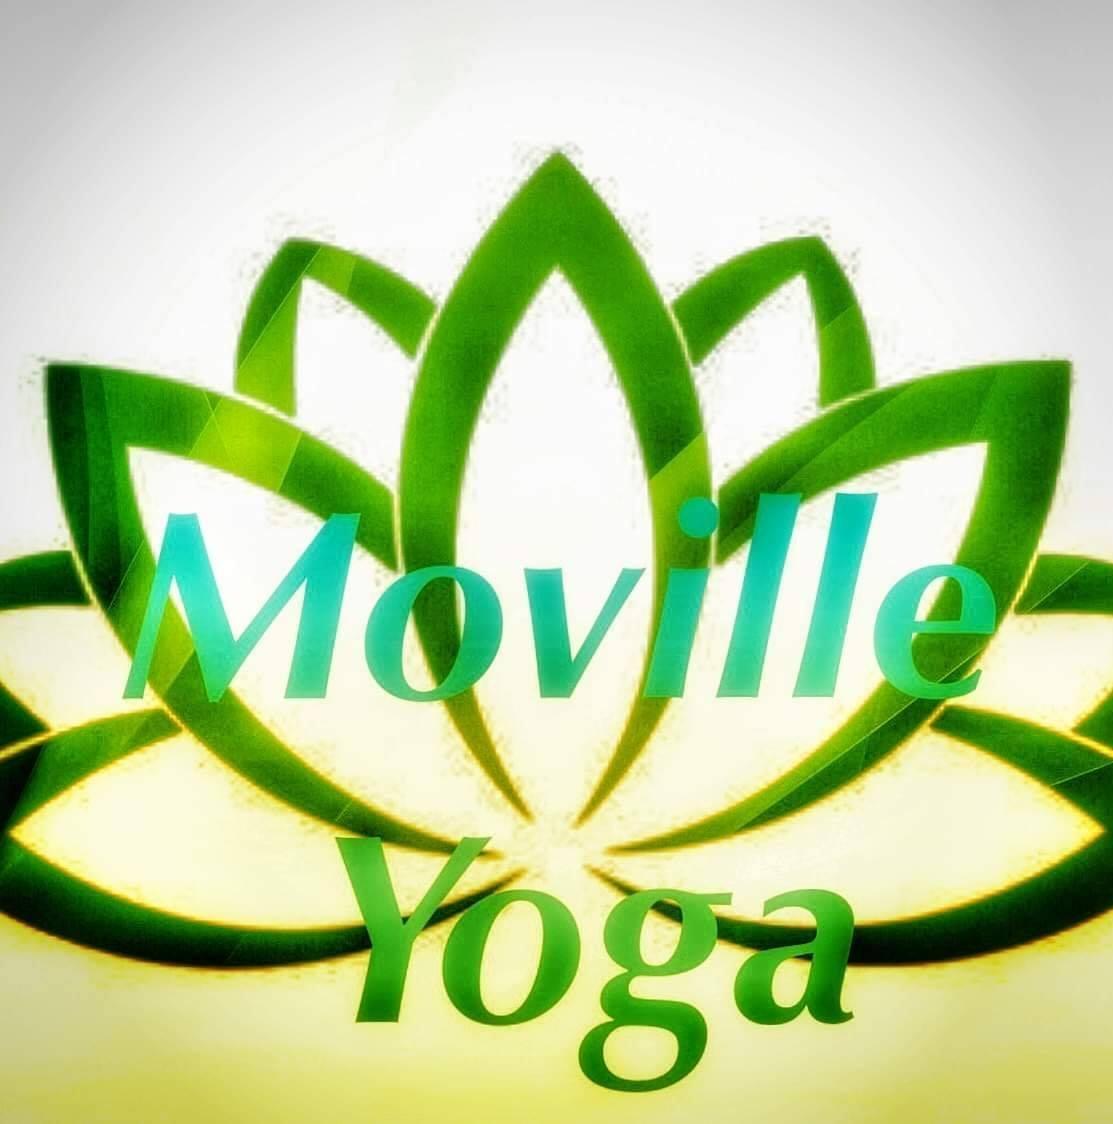 Moville Yoga